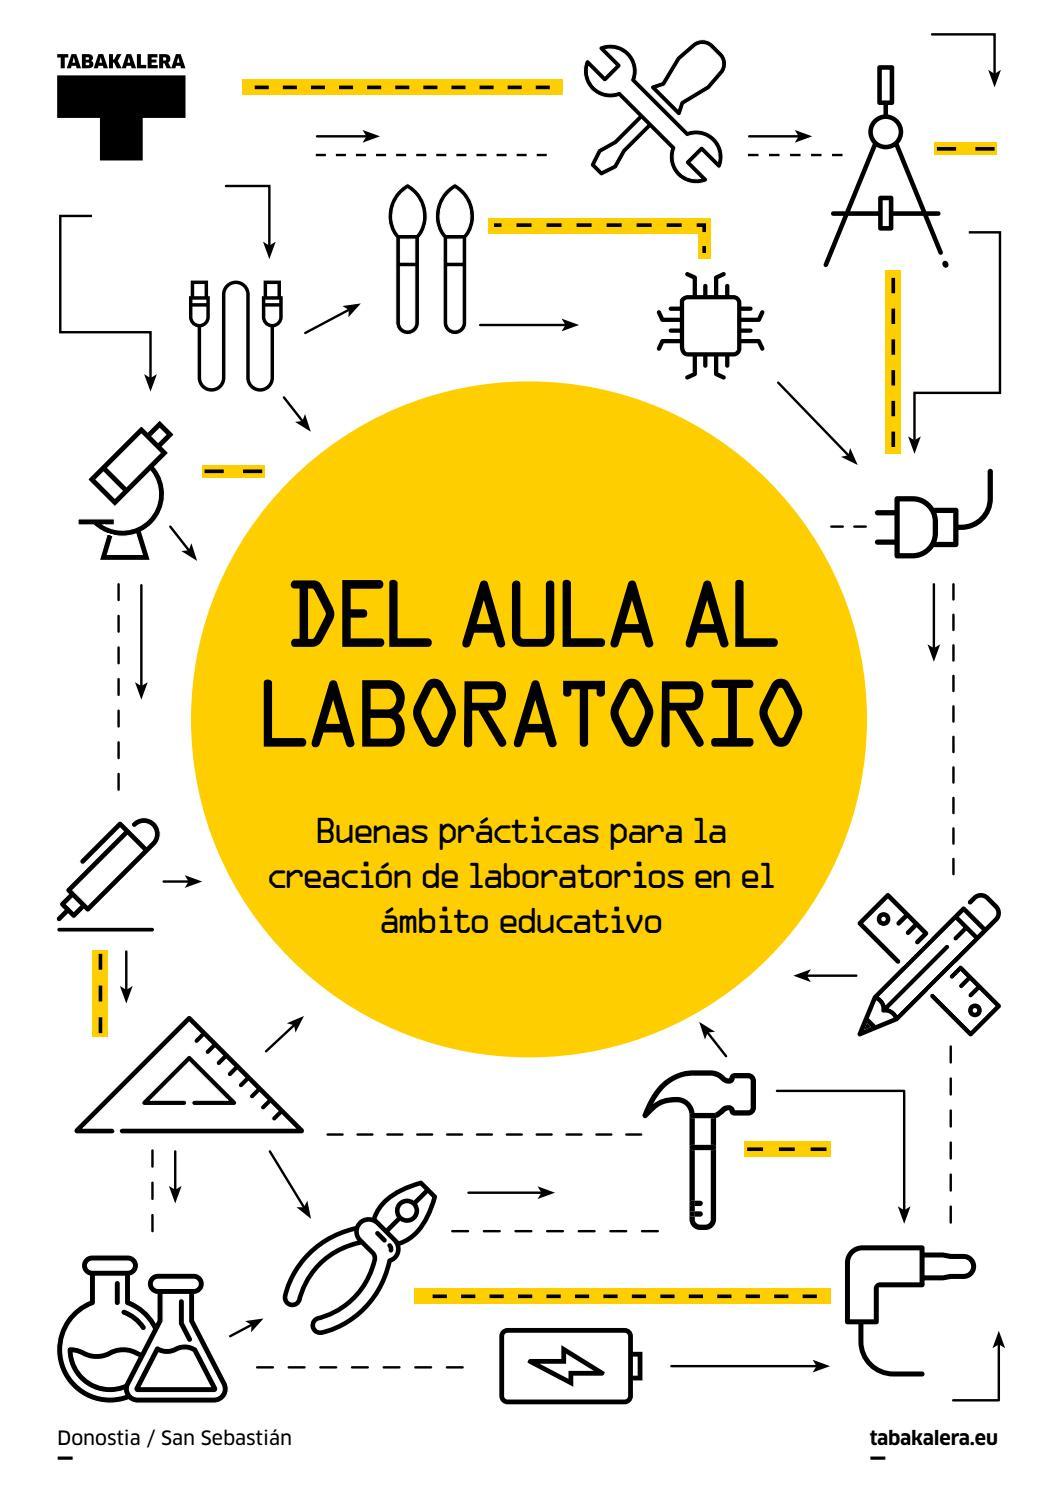 Del aula al laboratorio by Tabakalera - issuu